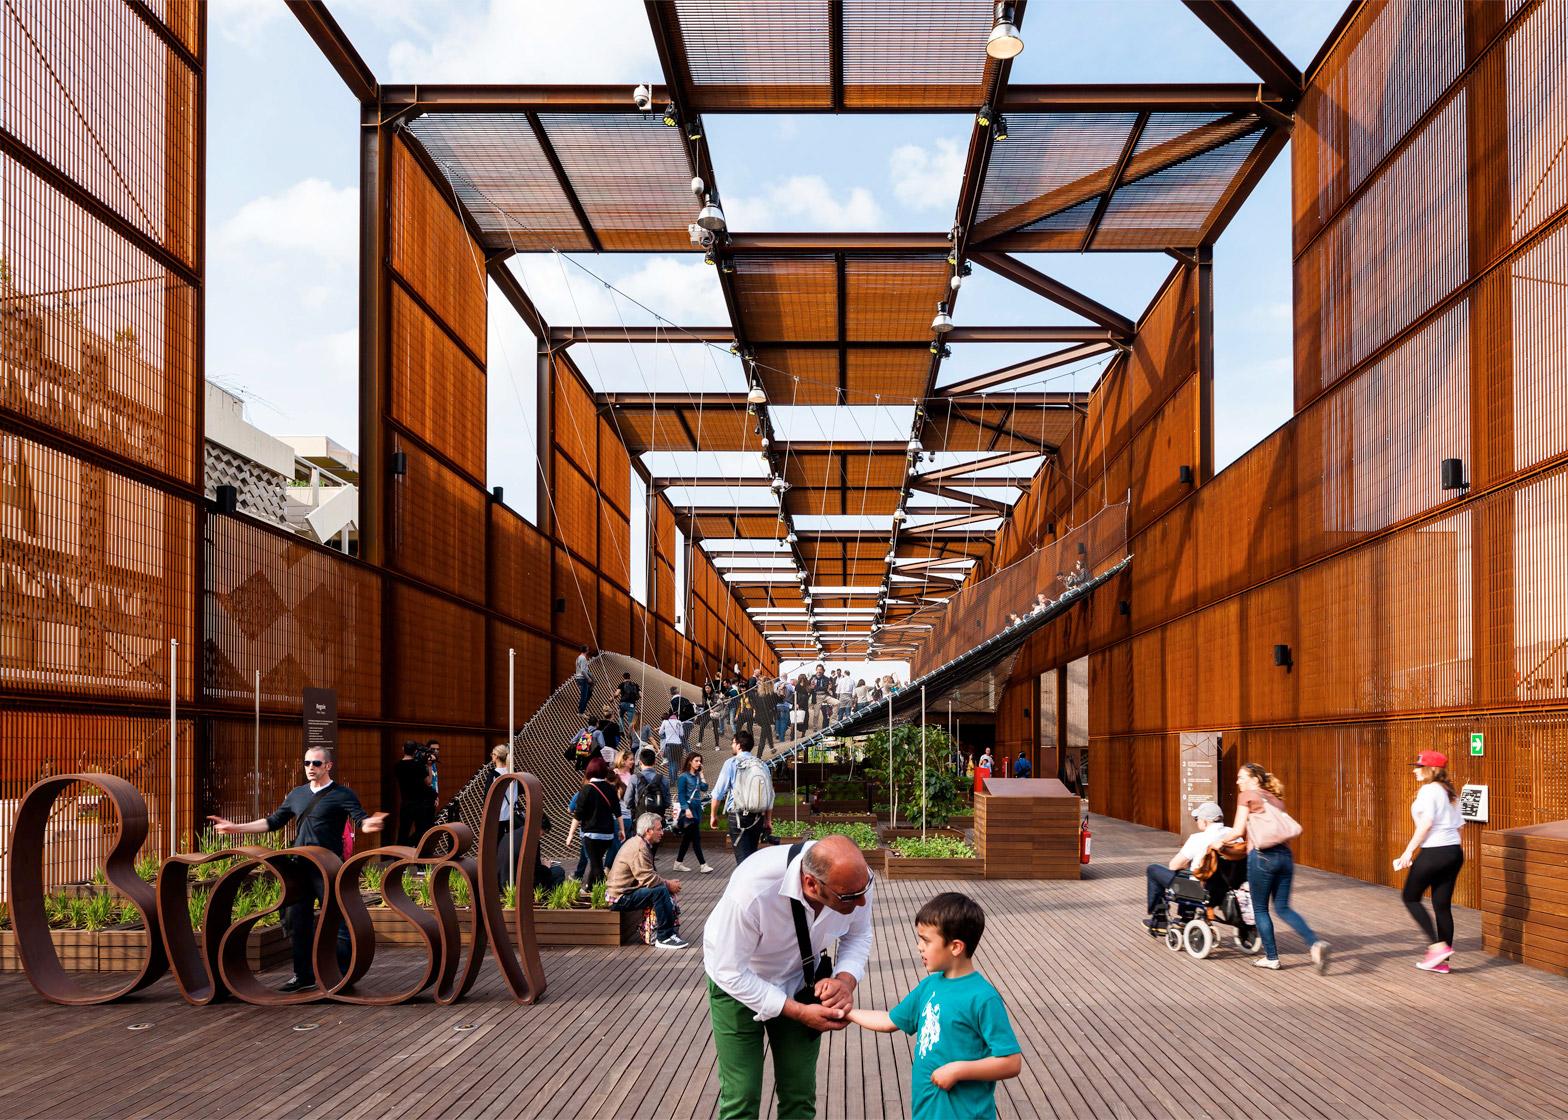 Brazilian Pavilion at Expo Milan 2015, Milan, Italy by Studio Arthur Casas and Atelier Marko Brajovićs